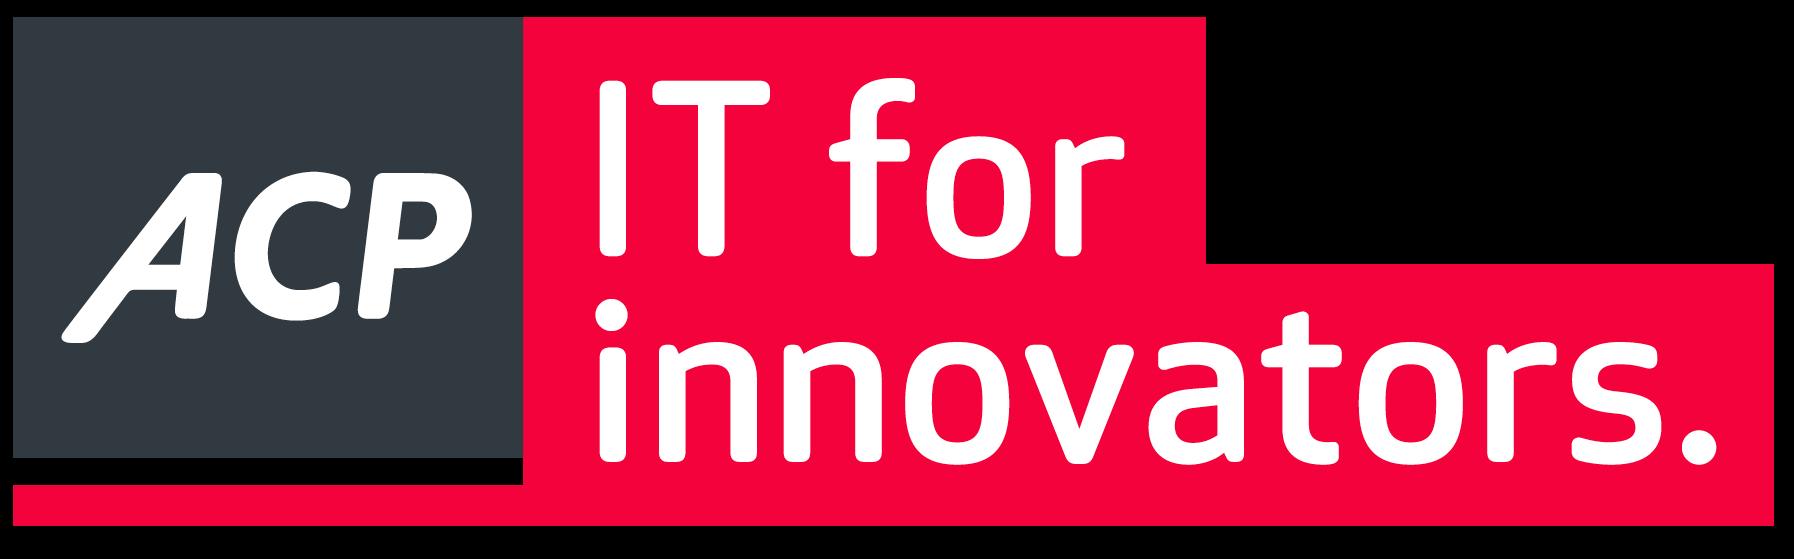 Acp itforinnovators logo rot rgb2